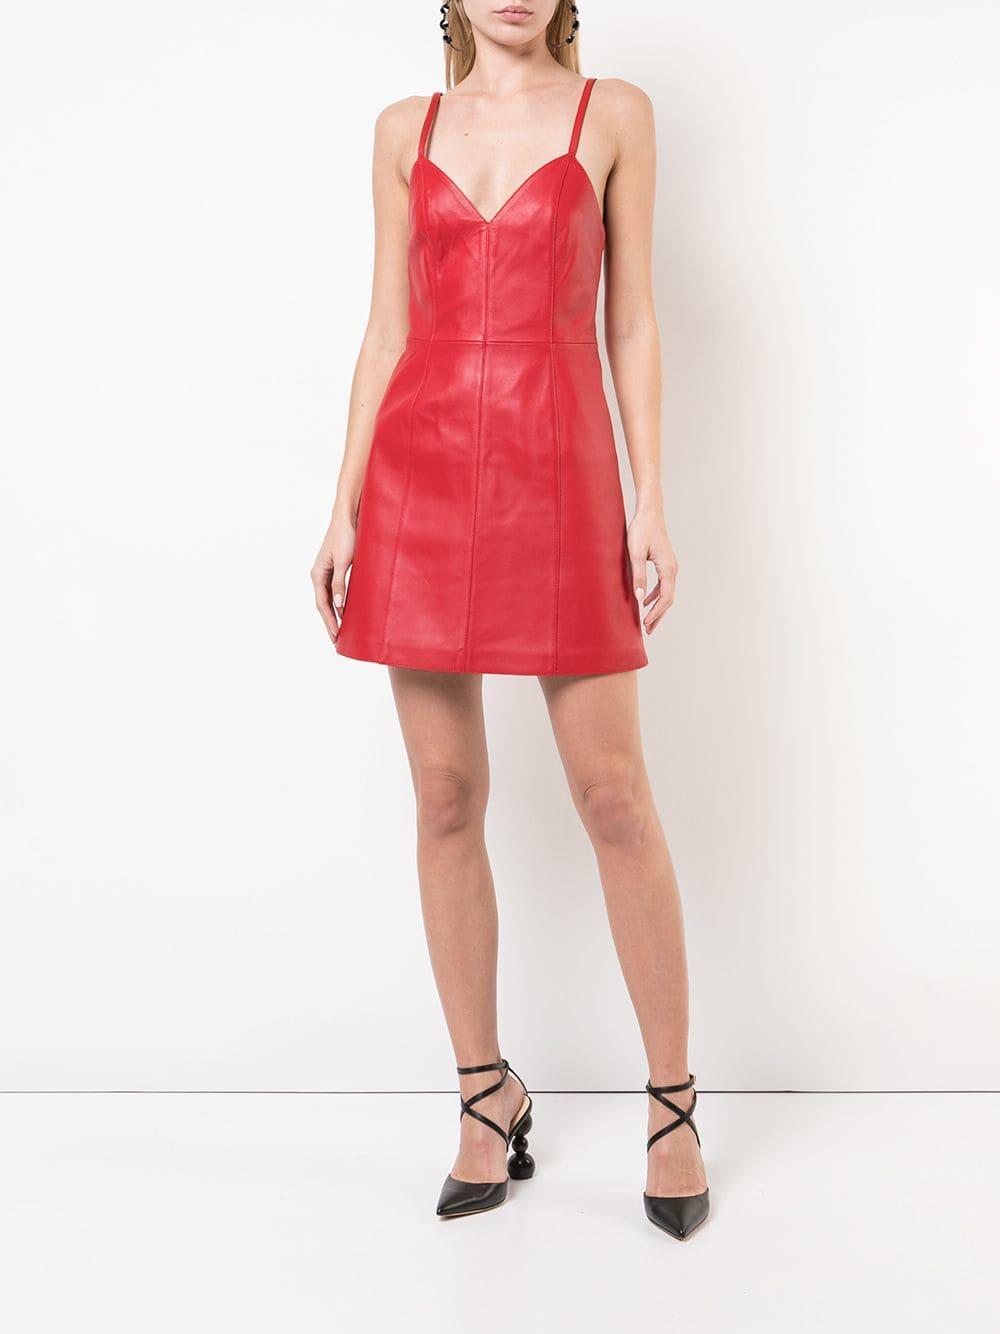 ALEXA CHUNG Flared Mini Red Dress